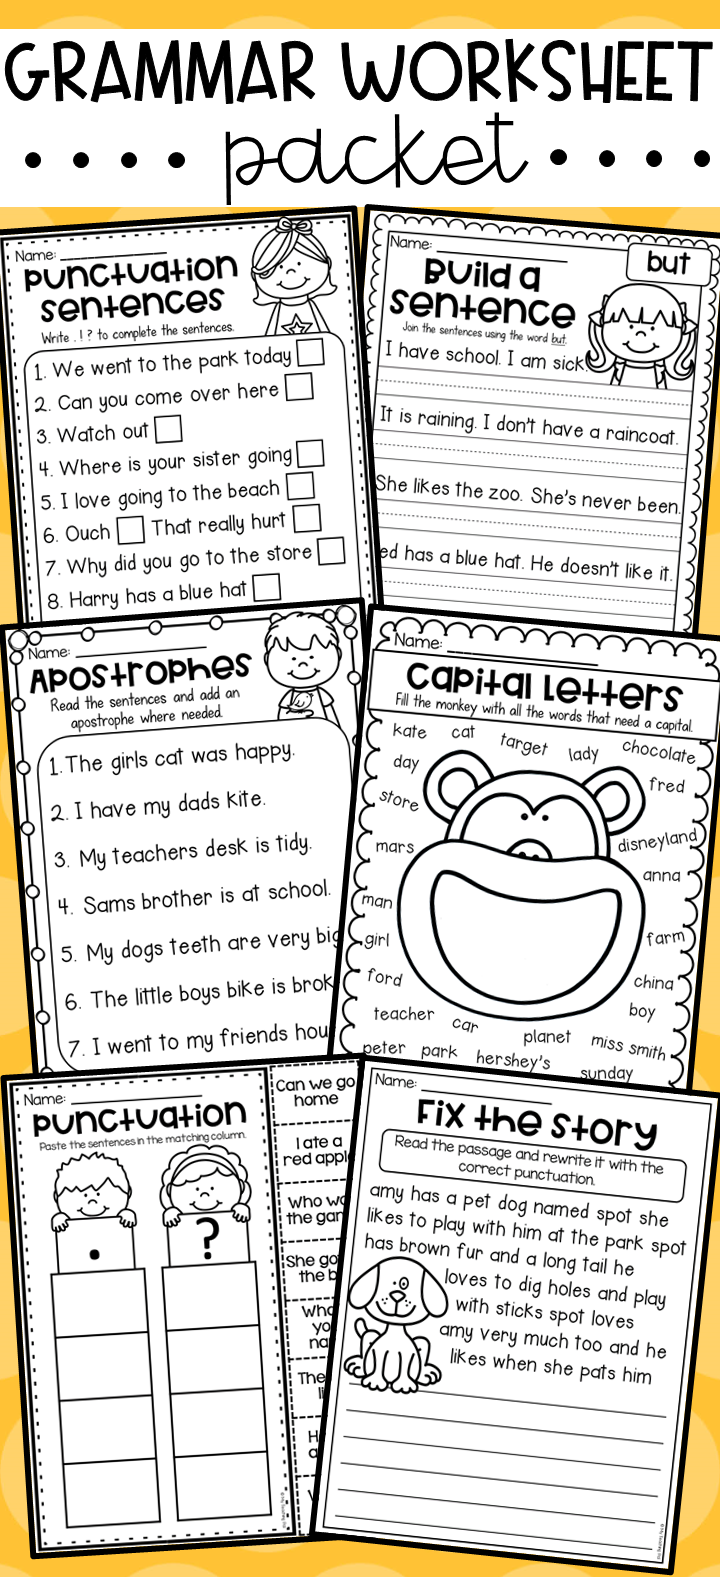 medium resolution of Grammar worksheets for punctuation